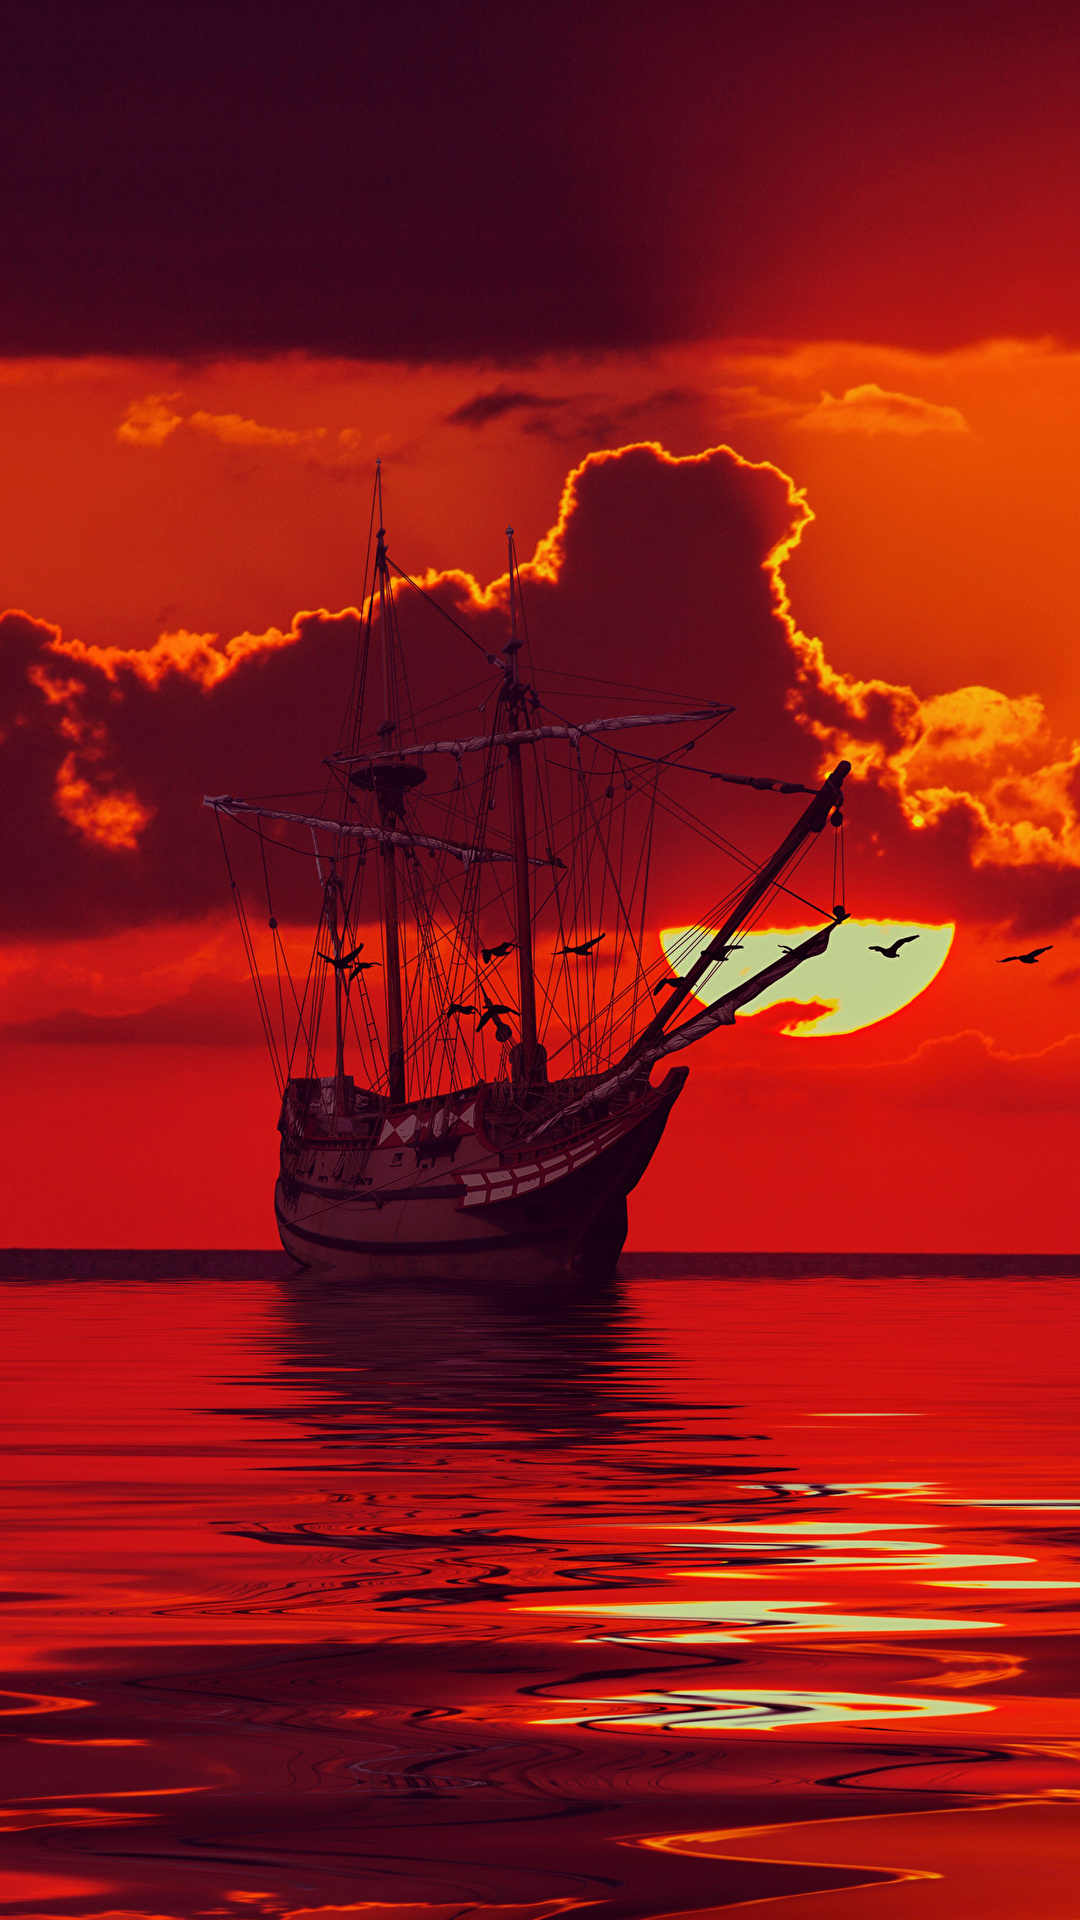 Bilder Rot Meer Sonne 3D-Grafik Himmel Schiffe Segeln Wolke 1080x1920